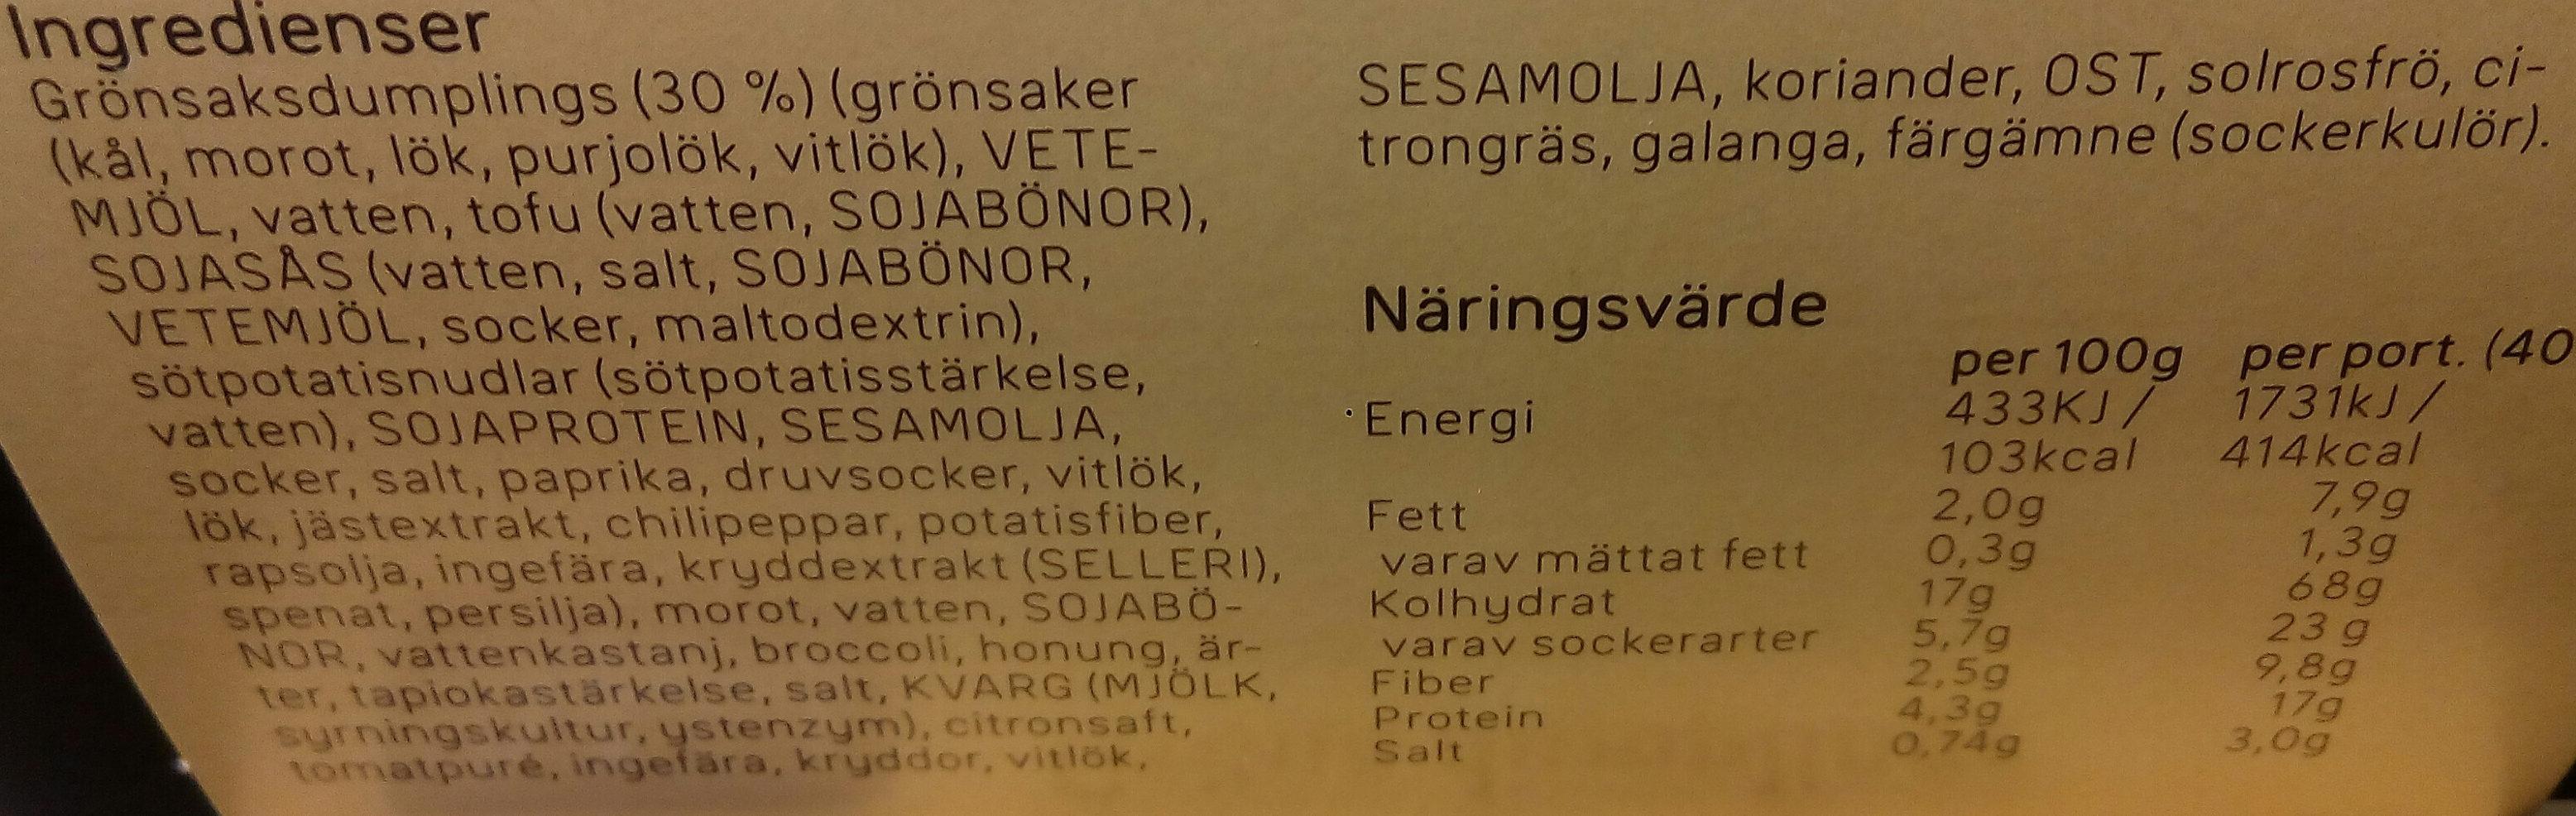 Dafgårds Gröna dumplings - Ingrédients